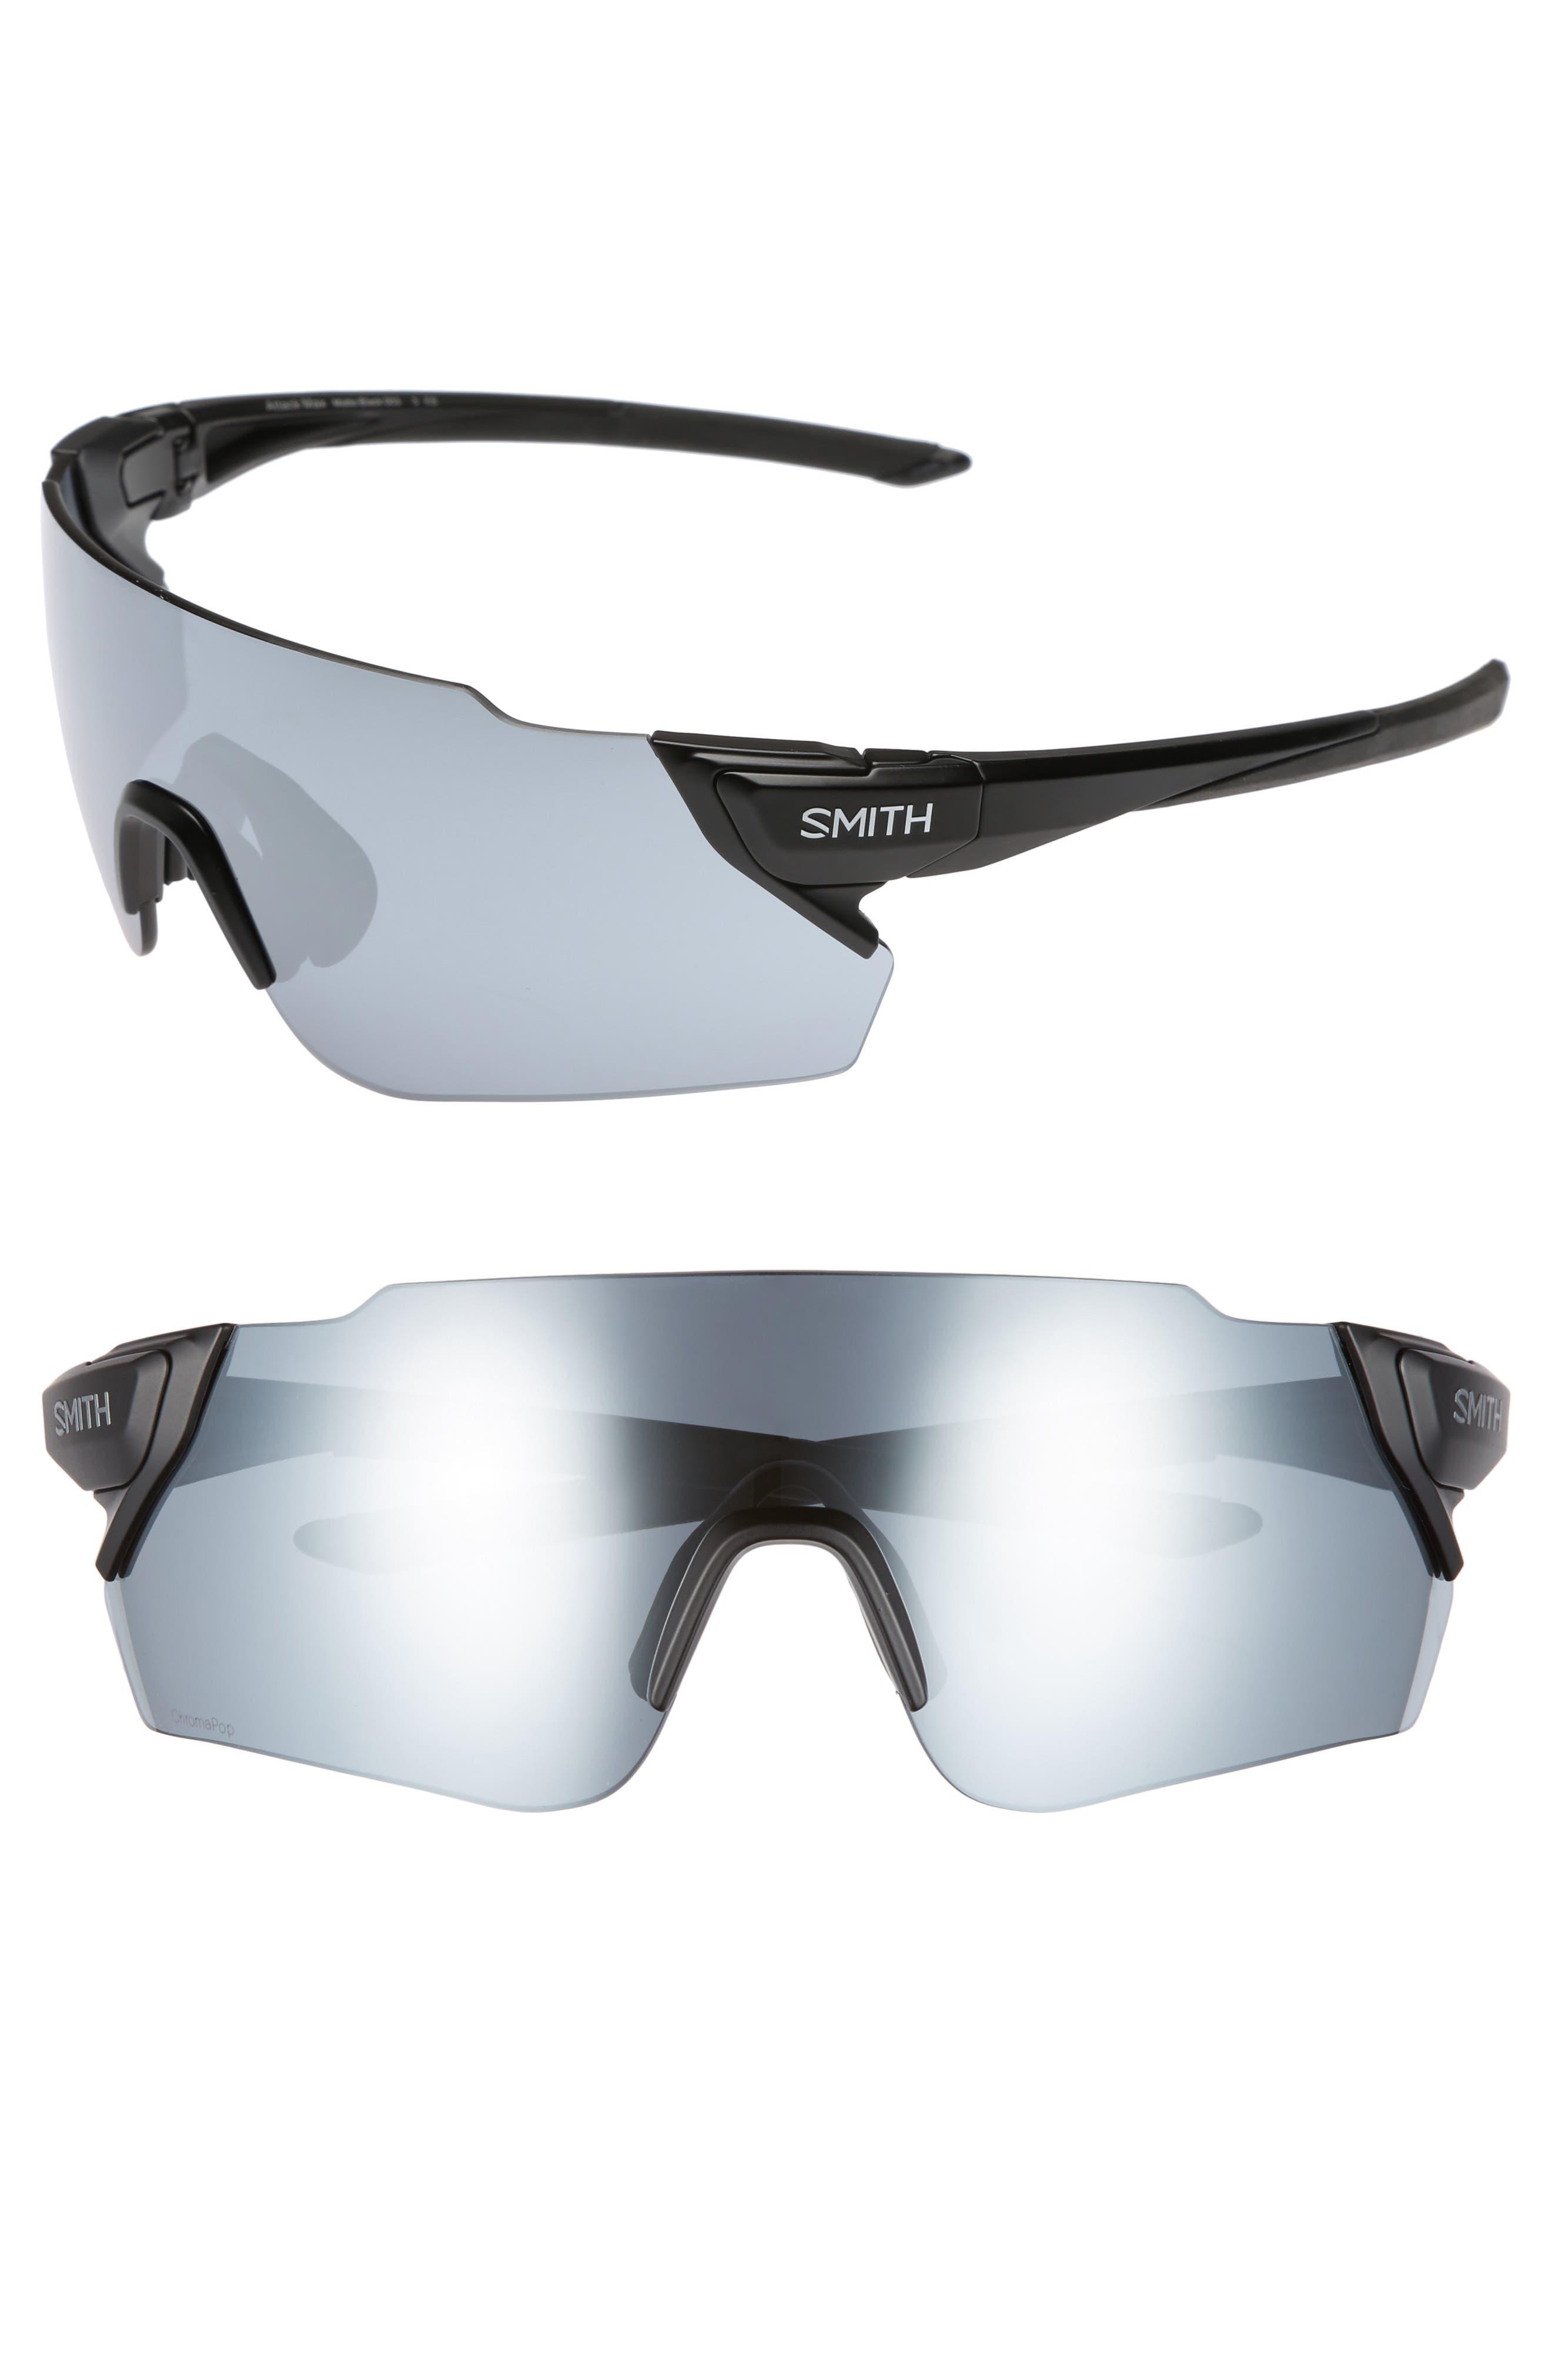 Attack Max 125mm ChromaPop<sup>™</sup> Polarized Shield Sunglasses,                             Main thumbnail 1, color,                             002